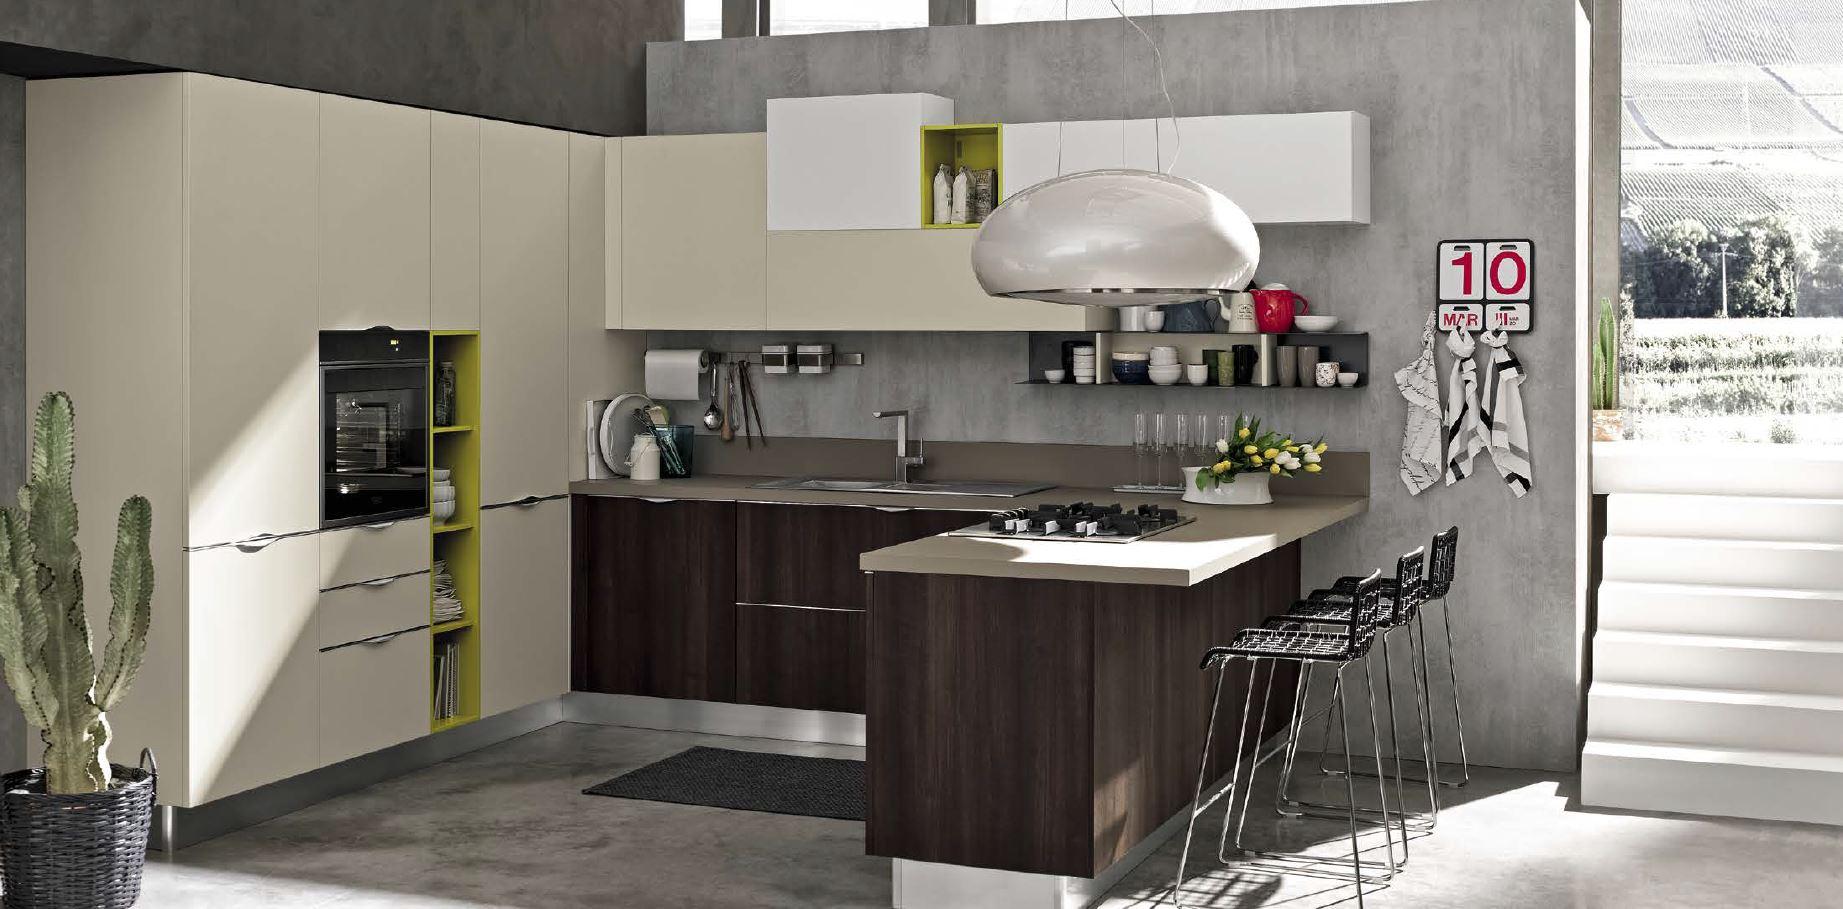 Centro cucine moderne arrex miton cucine moderne stosa for Arredamenti francavilla fontana